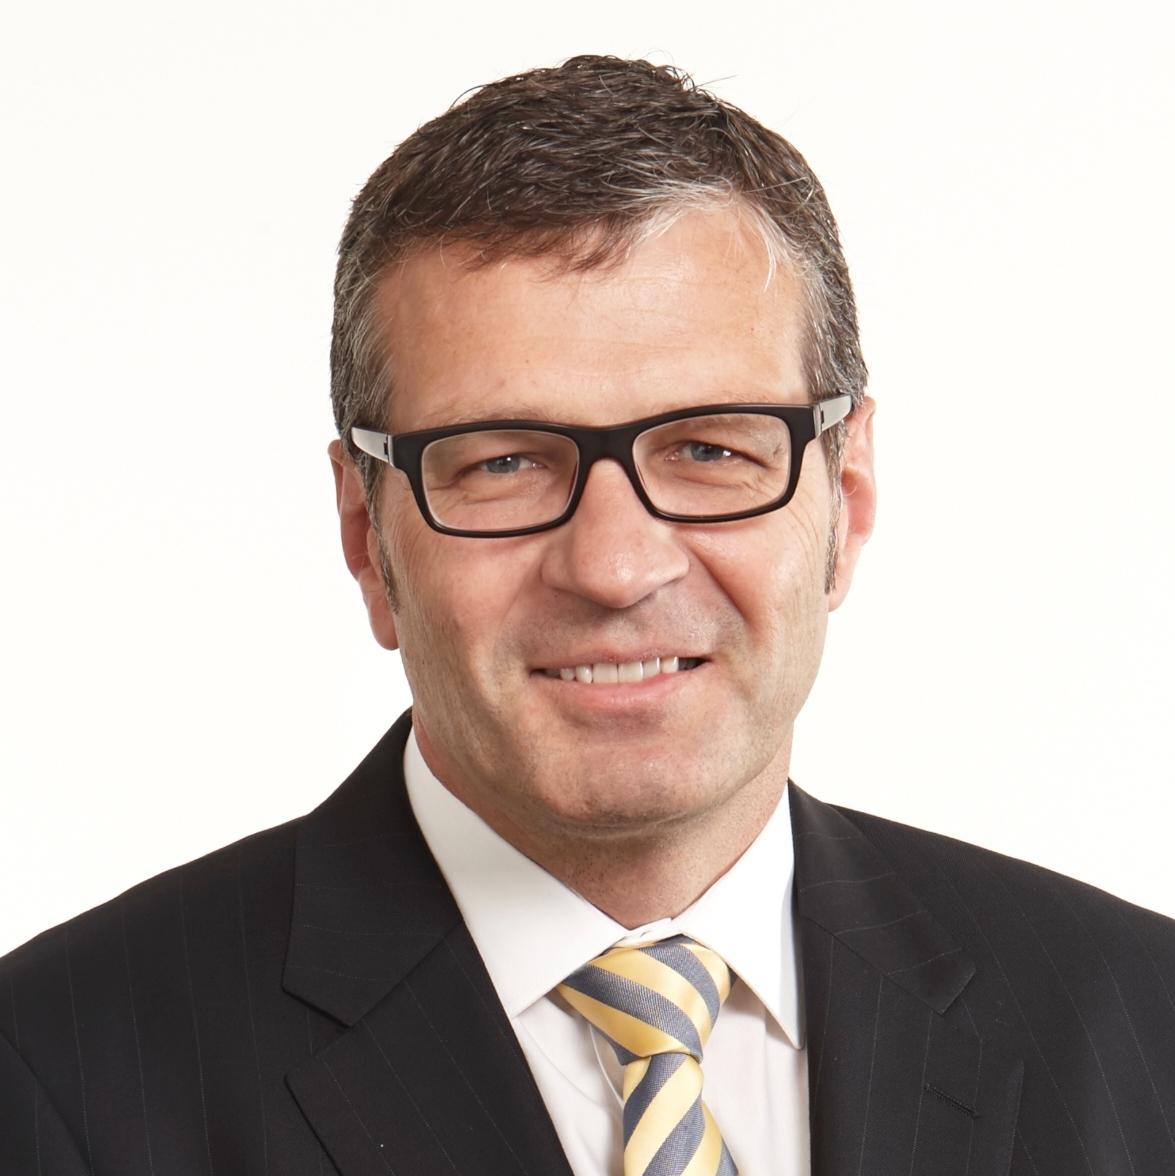 Greg Harris, BEc, LL.M, DipICArb (CIArb, London), FCIArb